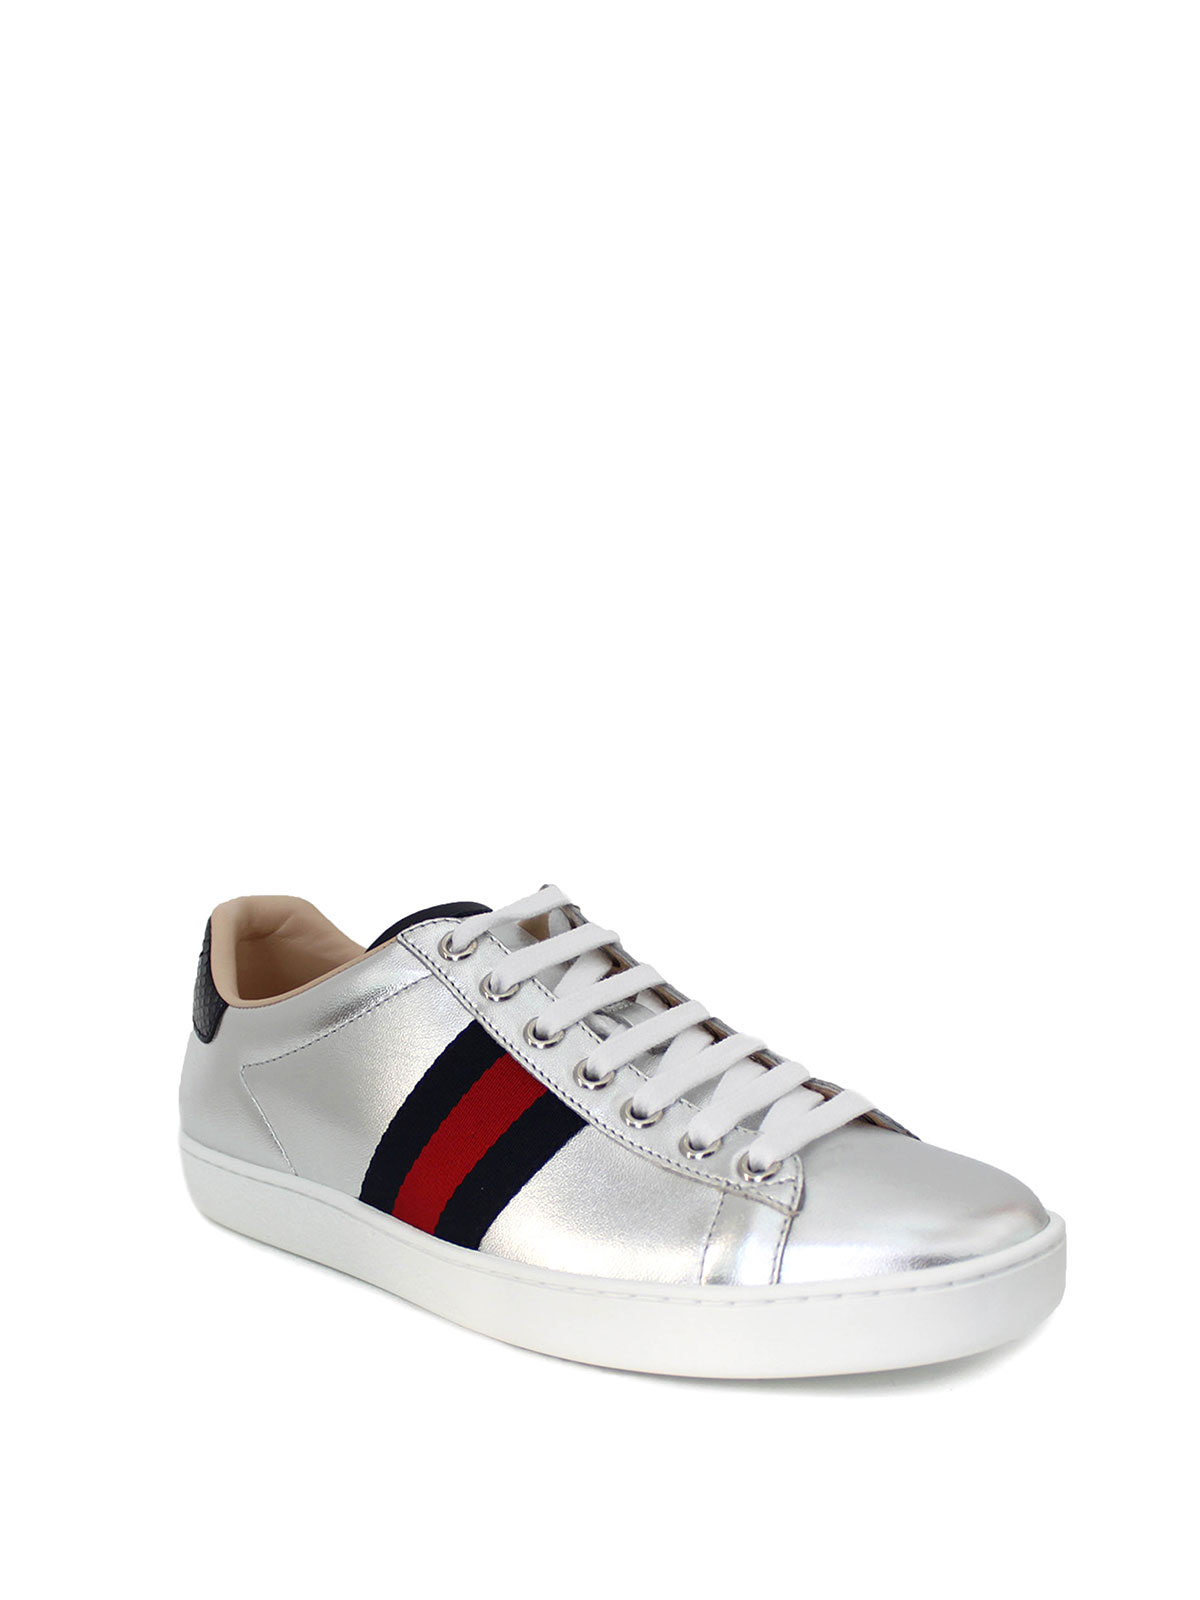 GUCCI Sneakers & Deportivas hombre cpBayQb7